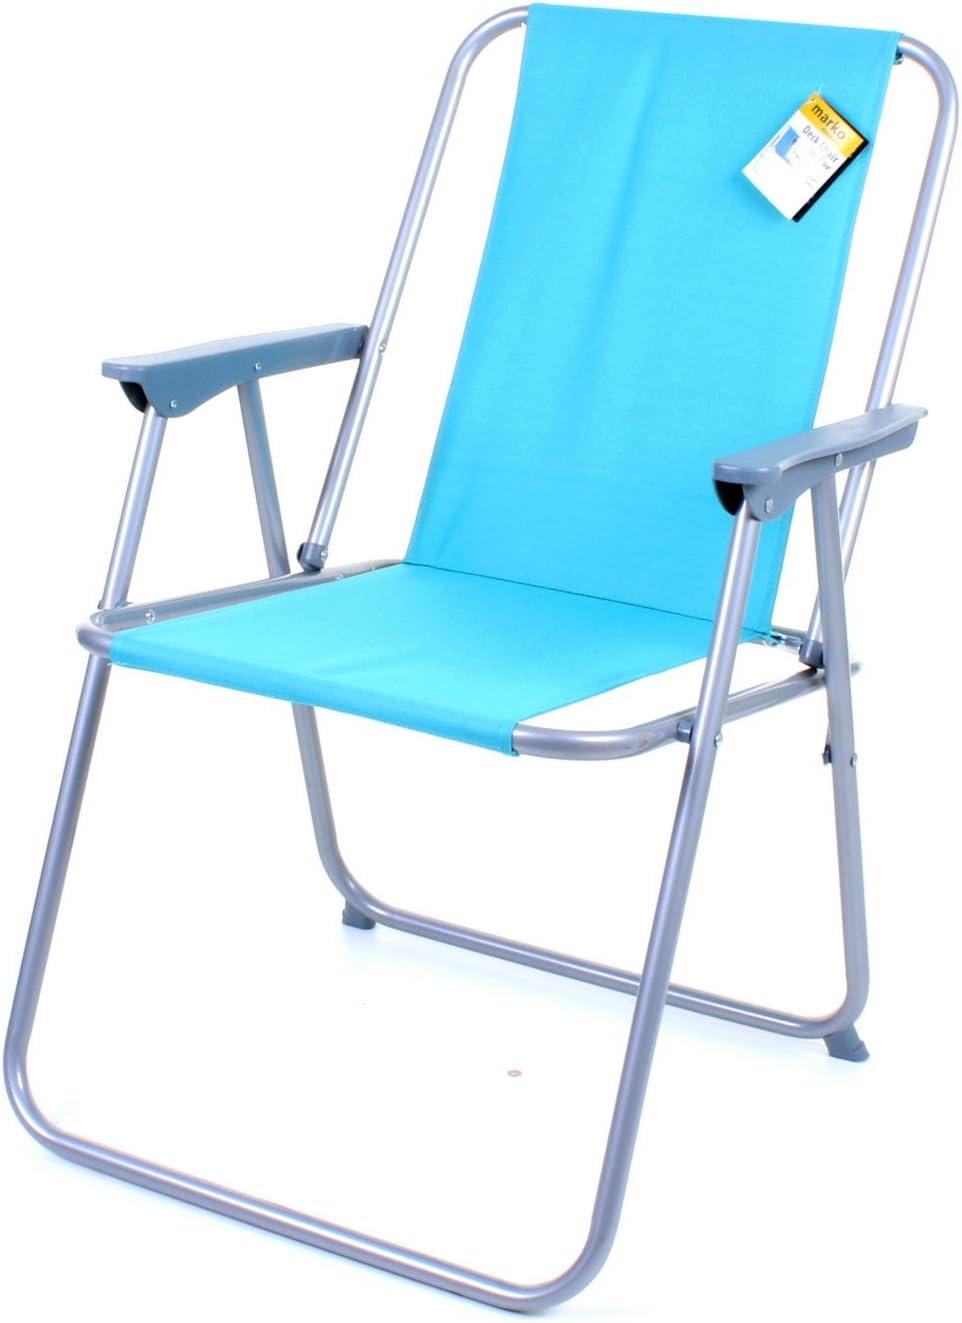 Marko Outdoor Deck Chair Folding Garden Lawn Patio Spring Foldable Seat Camping Outdoor (Sky Blue)